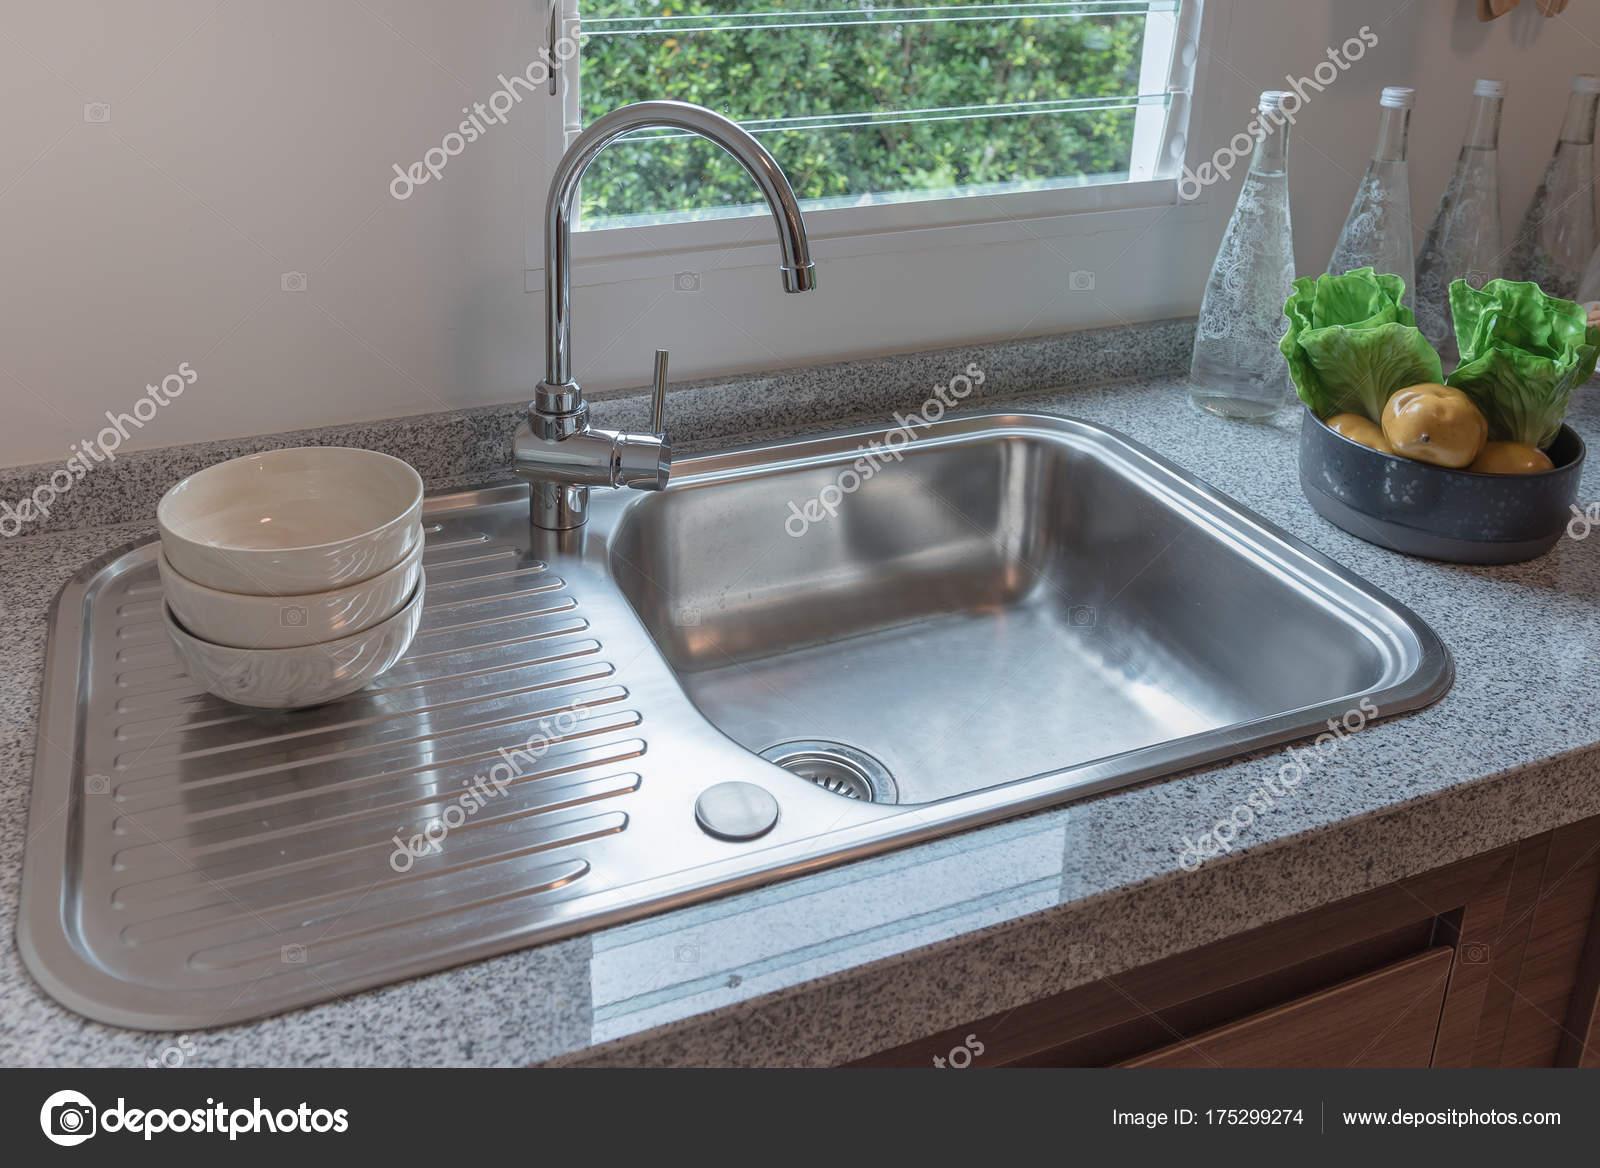 Küchenspüle auf moderne Theke — Stockfoto © khongkitwiriyachan ...